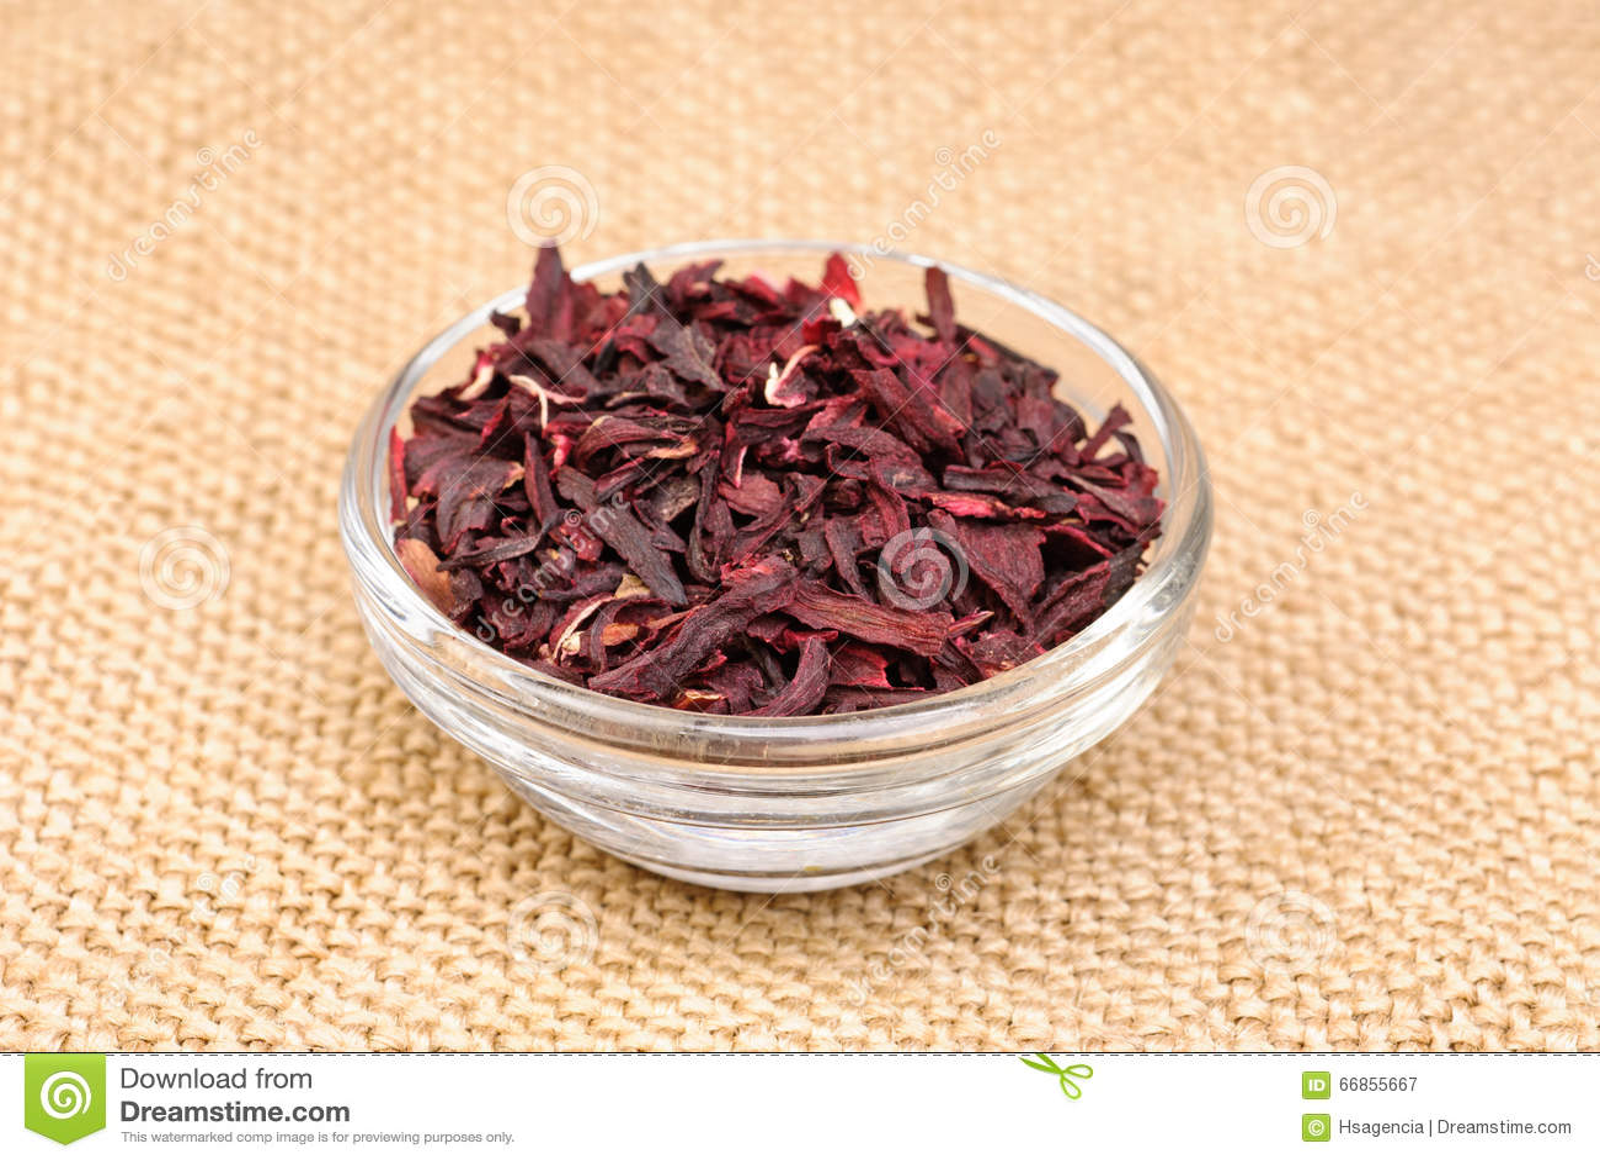 Hibiscus Tea Macro Dry Flower Stock Image Image Of Fresh Aromatic